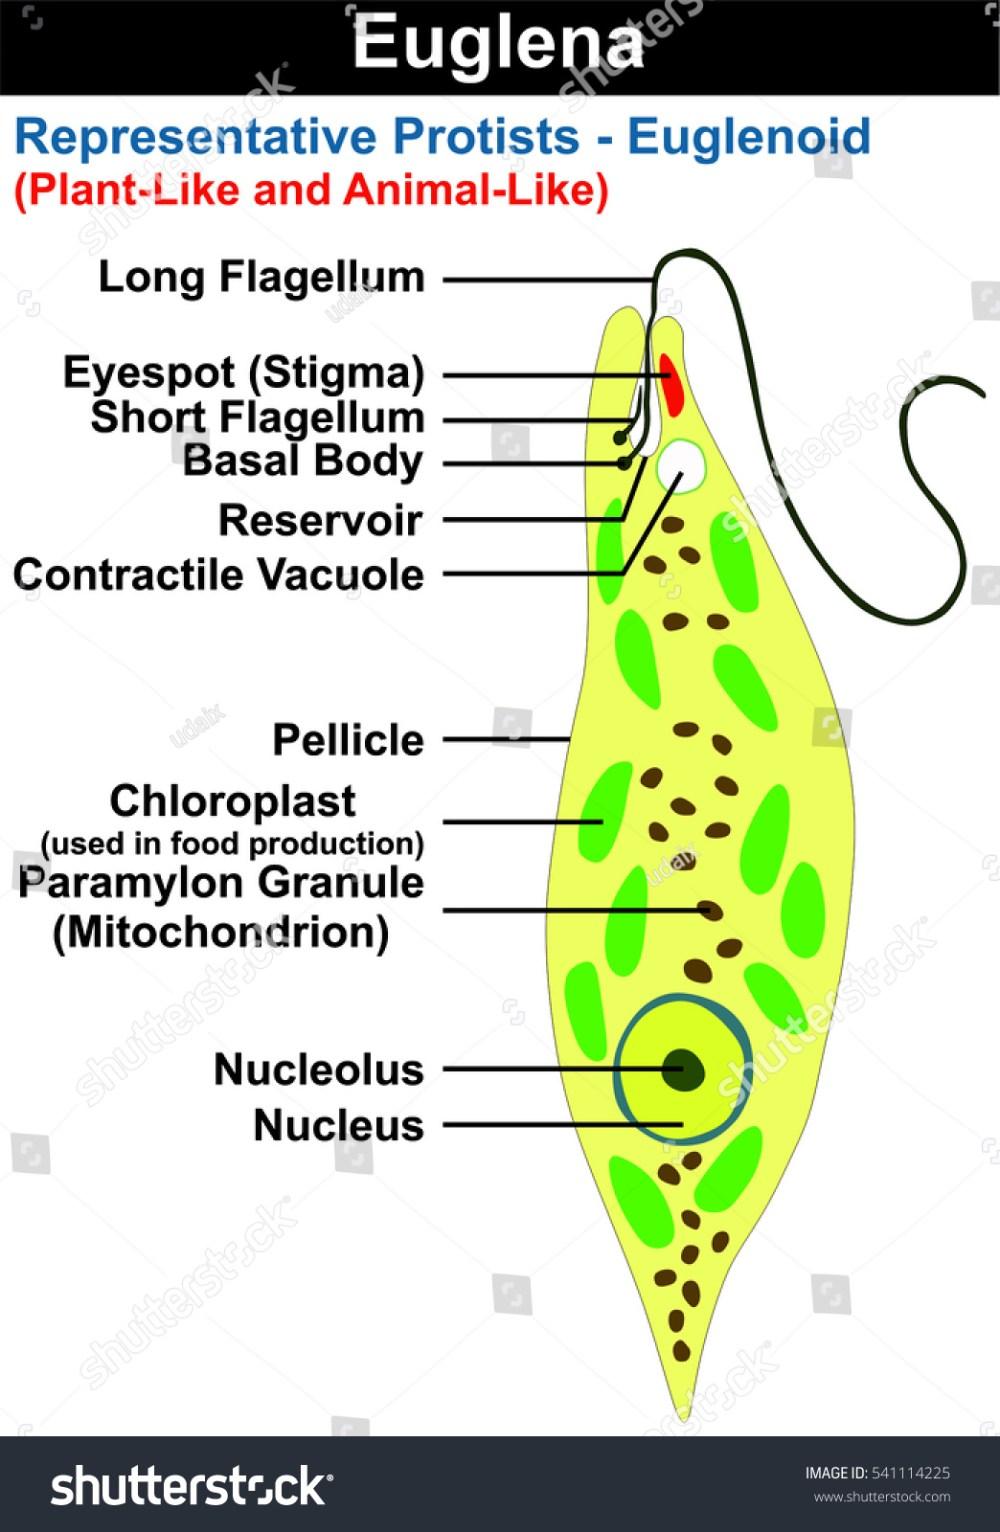 medium resolution of euglena cross section diagram representative protists stock rh shutterstock com diagram of protists a diagram of protist for schoo